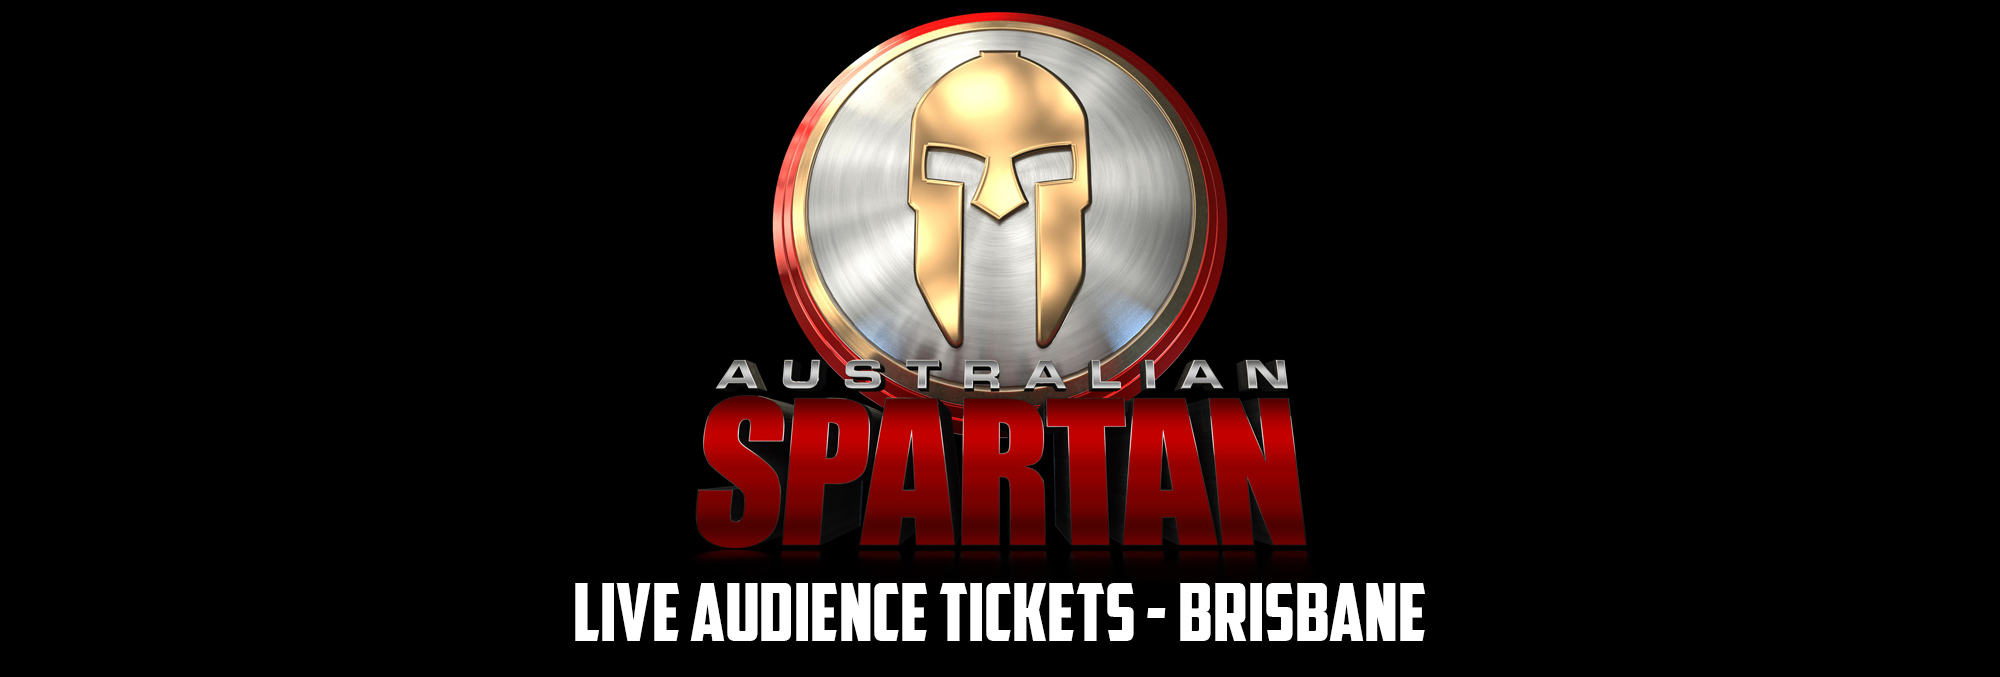 Australian Spartan Logo